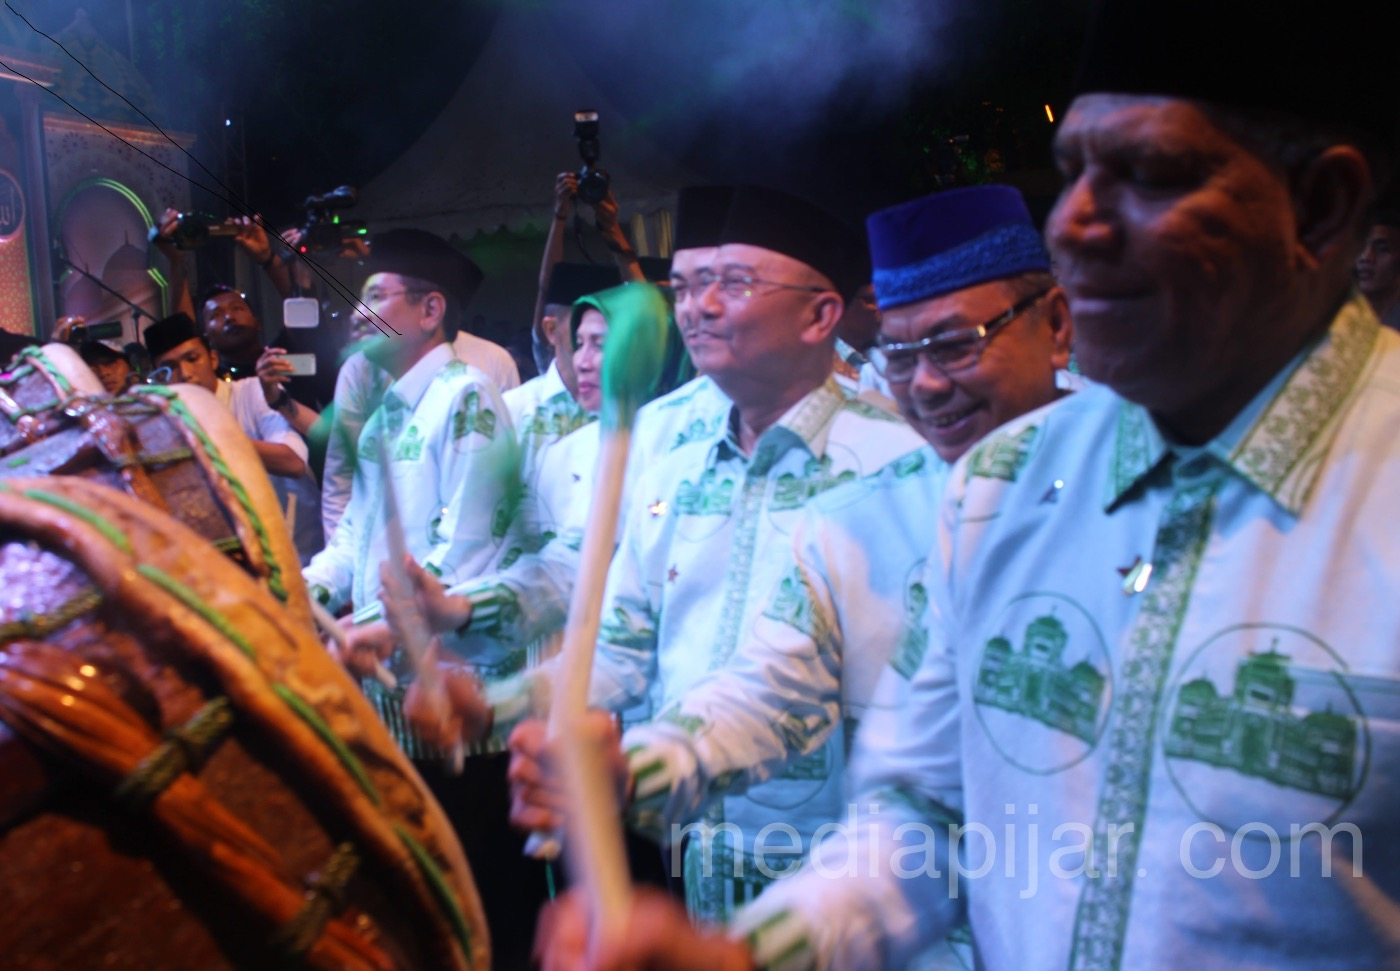 Gubernur Sumatera Utara, Bapak Dr. Ir. H. Tengku Erry Nuradi, M.Si, dan juga Wali Kota Medan, Bapak Drs. H. T. Dzulmi Eldin S, M.Si resmi membuka Ramadhan Fair 2018 pada Sabtu, 19 Mei 2018 di Taman Sri Deli. (Fotografer: Muhammad Hidayat)